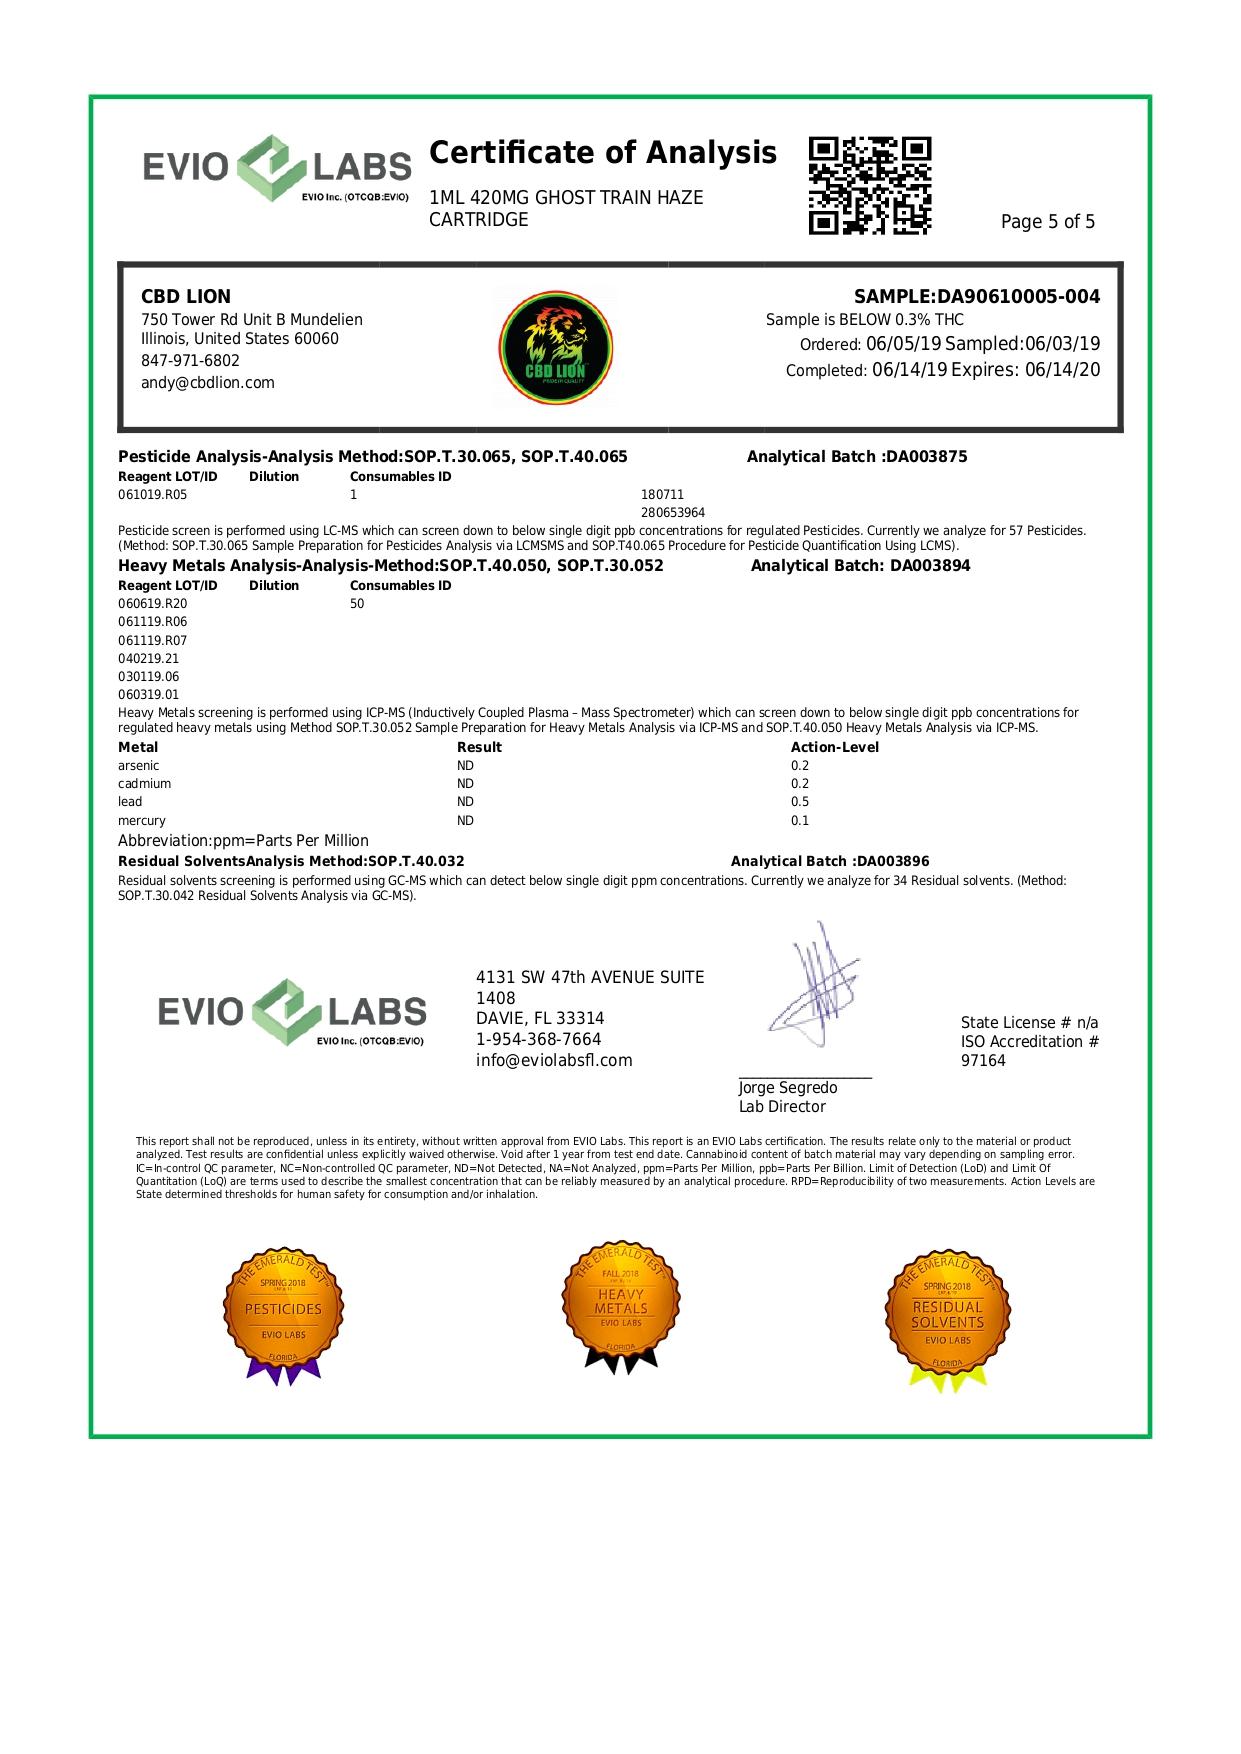 CBD Lion CBD Cartridge Ghost Train Haze 420mg Lab Report